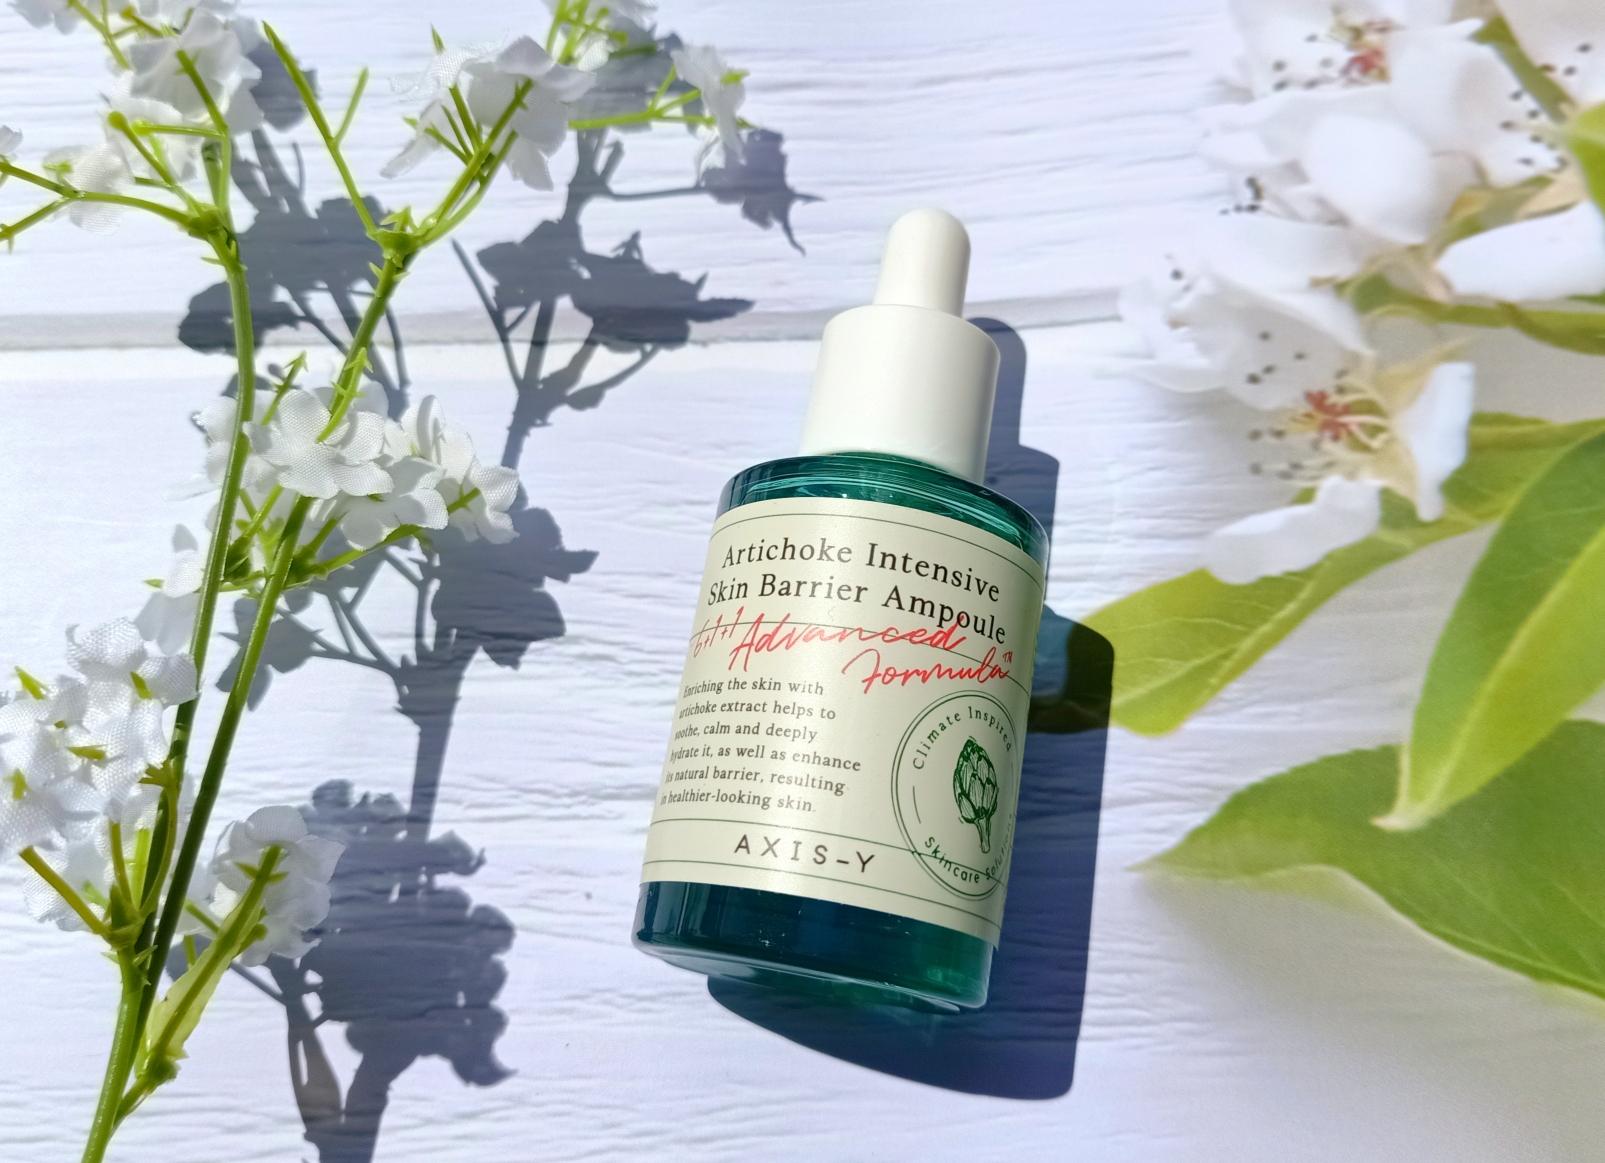 Calming Skin with Axis-Y Artichoke Intensive Skin Barrier Ampoule